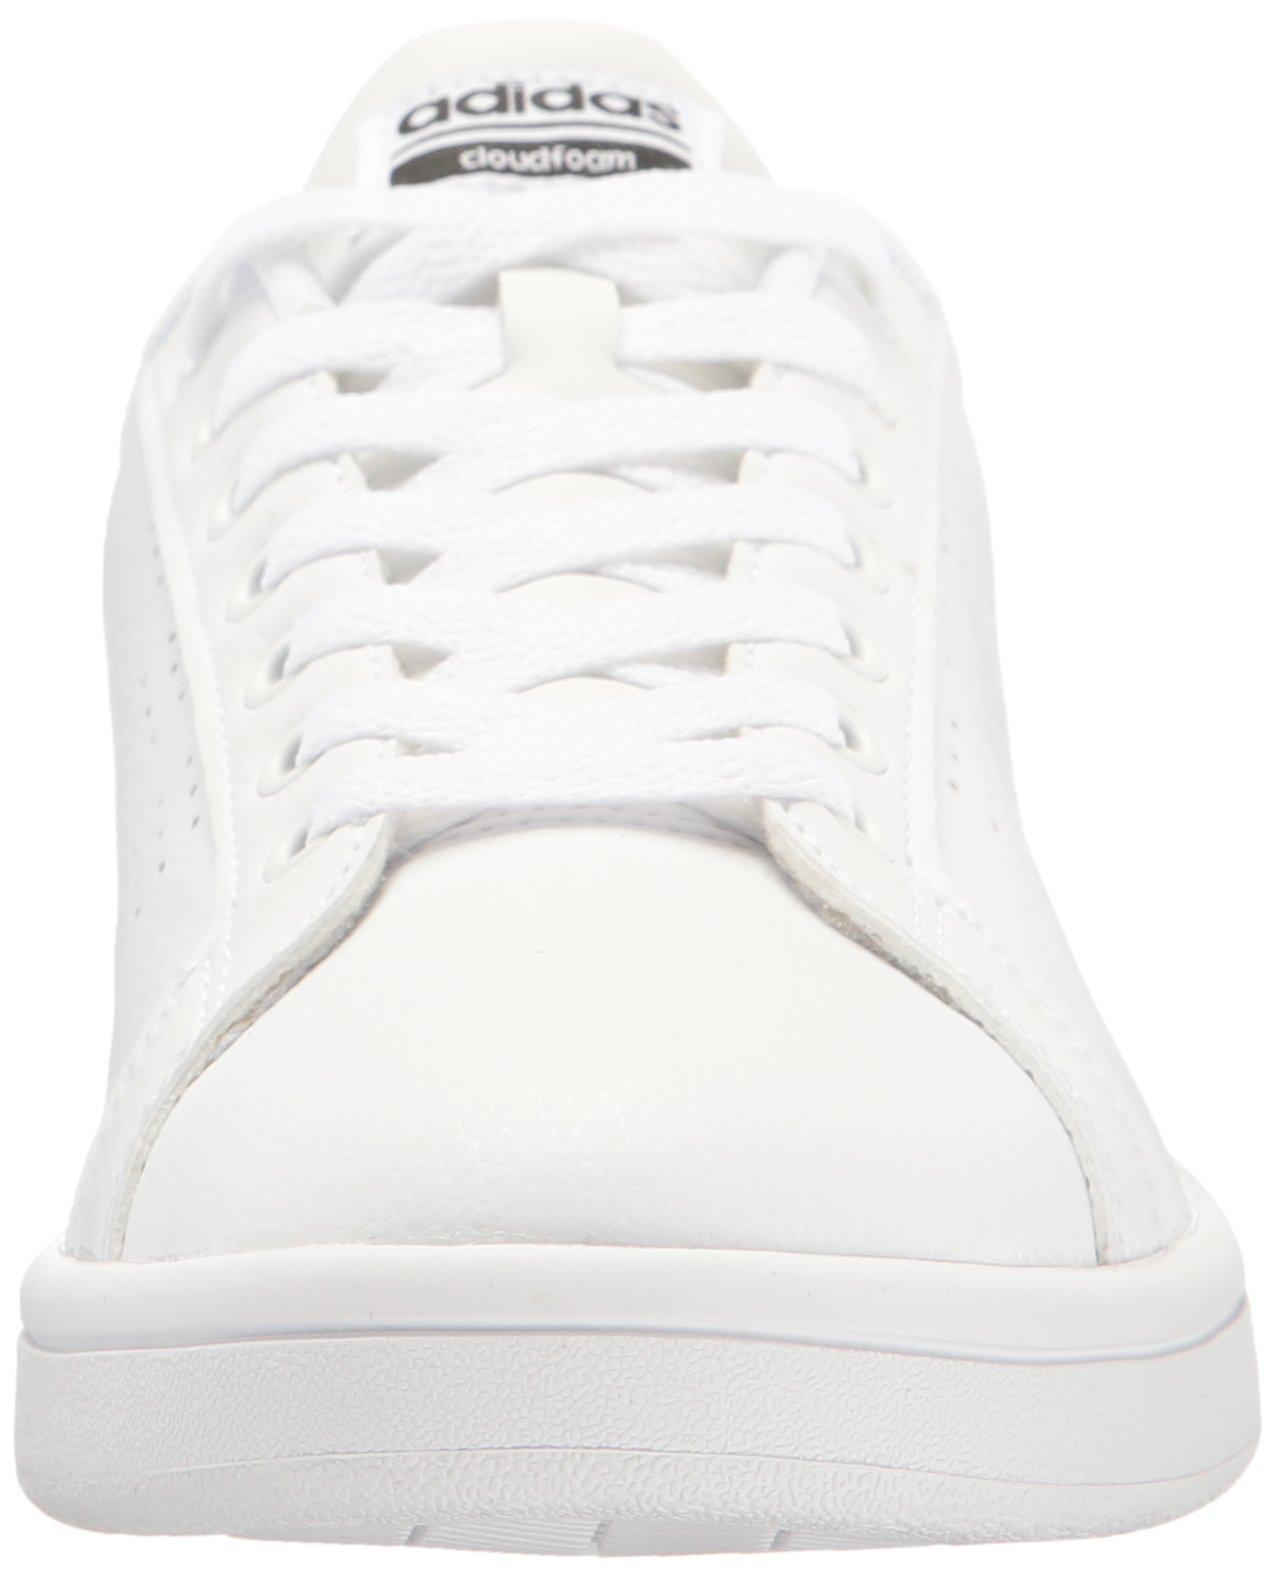 adidas Women's Shoes Cloudfoam Advantage Clean Sneakers, White/White/Black, (7.5 M US) by adidas (Image #4)